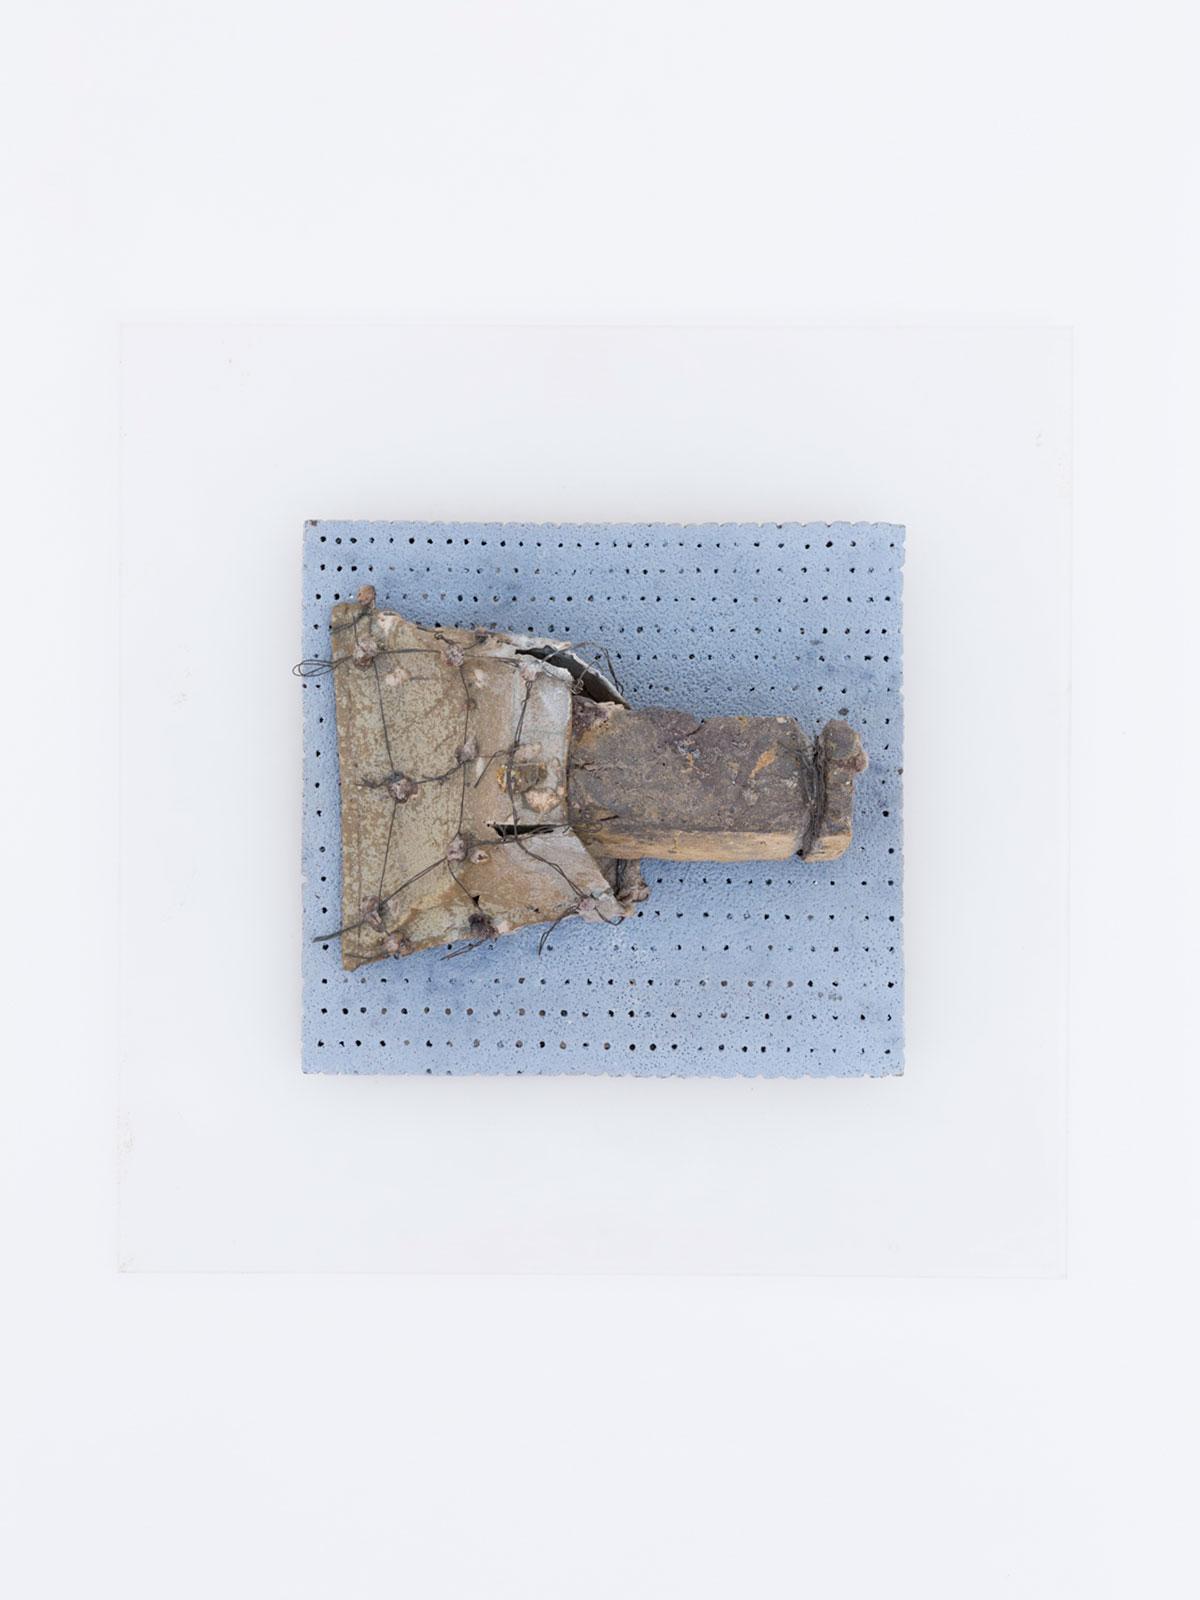 8.Wall-mounted-brick-bag-1981-Melted-brick-in-fibreglass-bag-ceramic-wire-58-x-58-x-15-cm - Copy.jpg